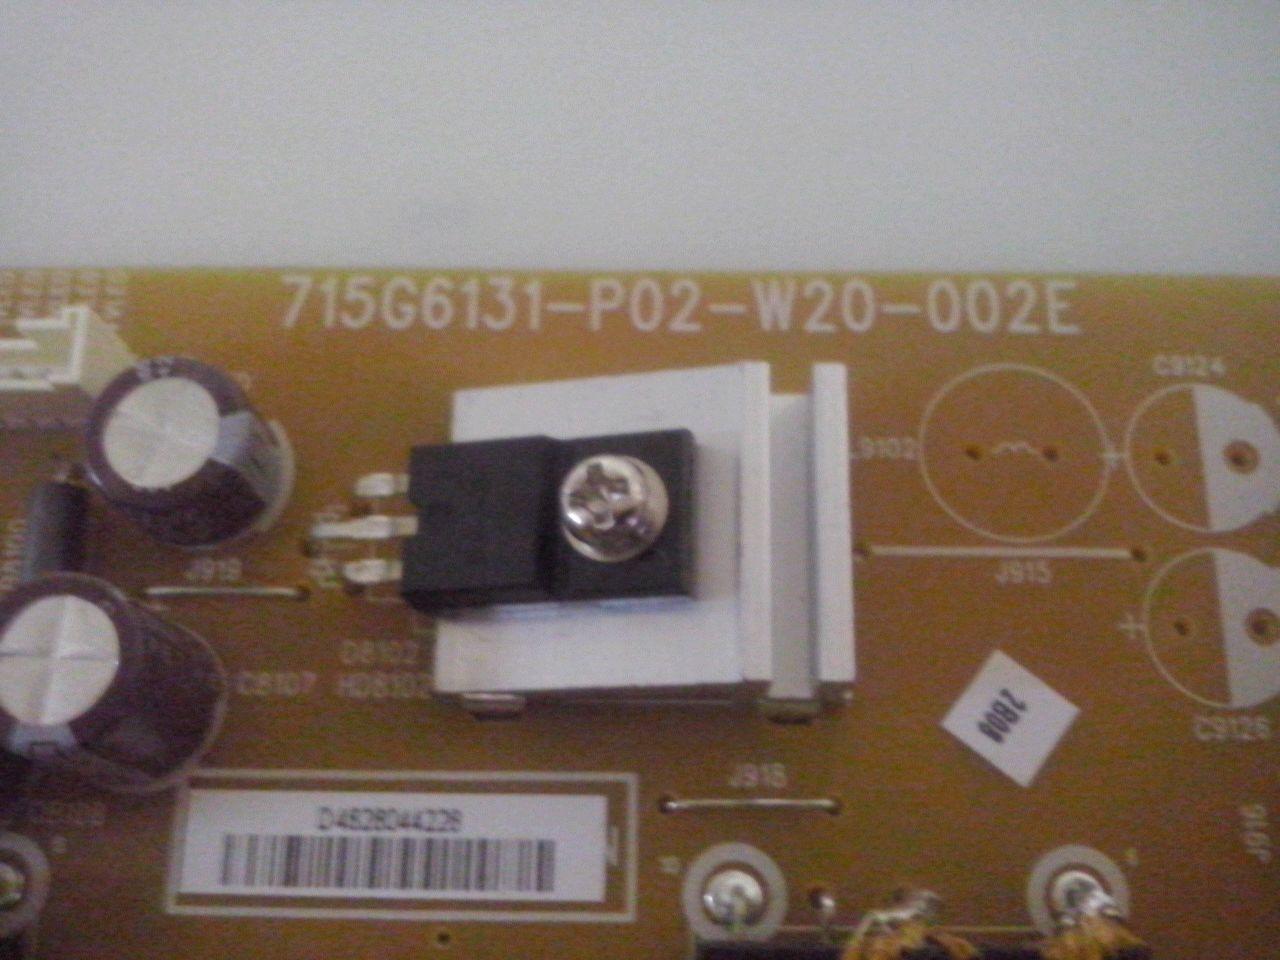 Full Size of Protron W20 Bedienungsanleitung Alarmanlage Proton App Smart Home Wohnzimmer Protron W20